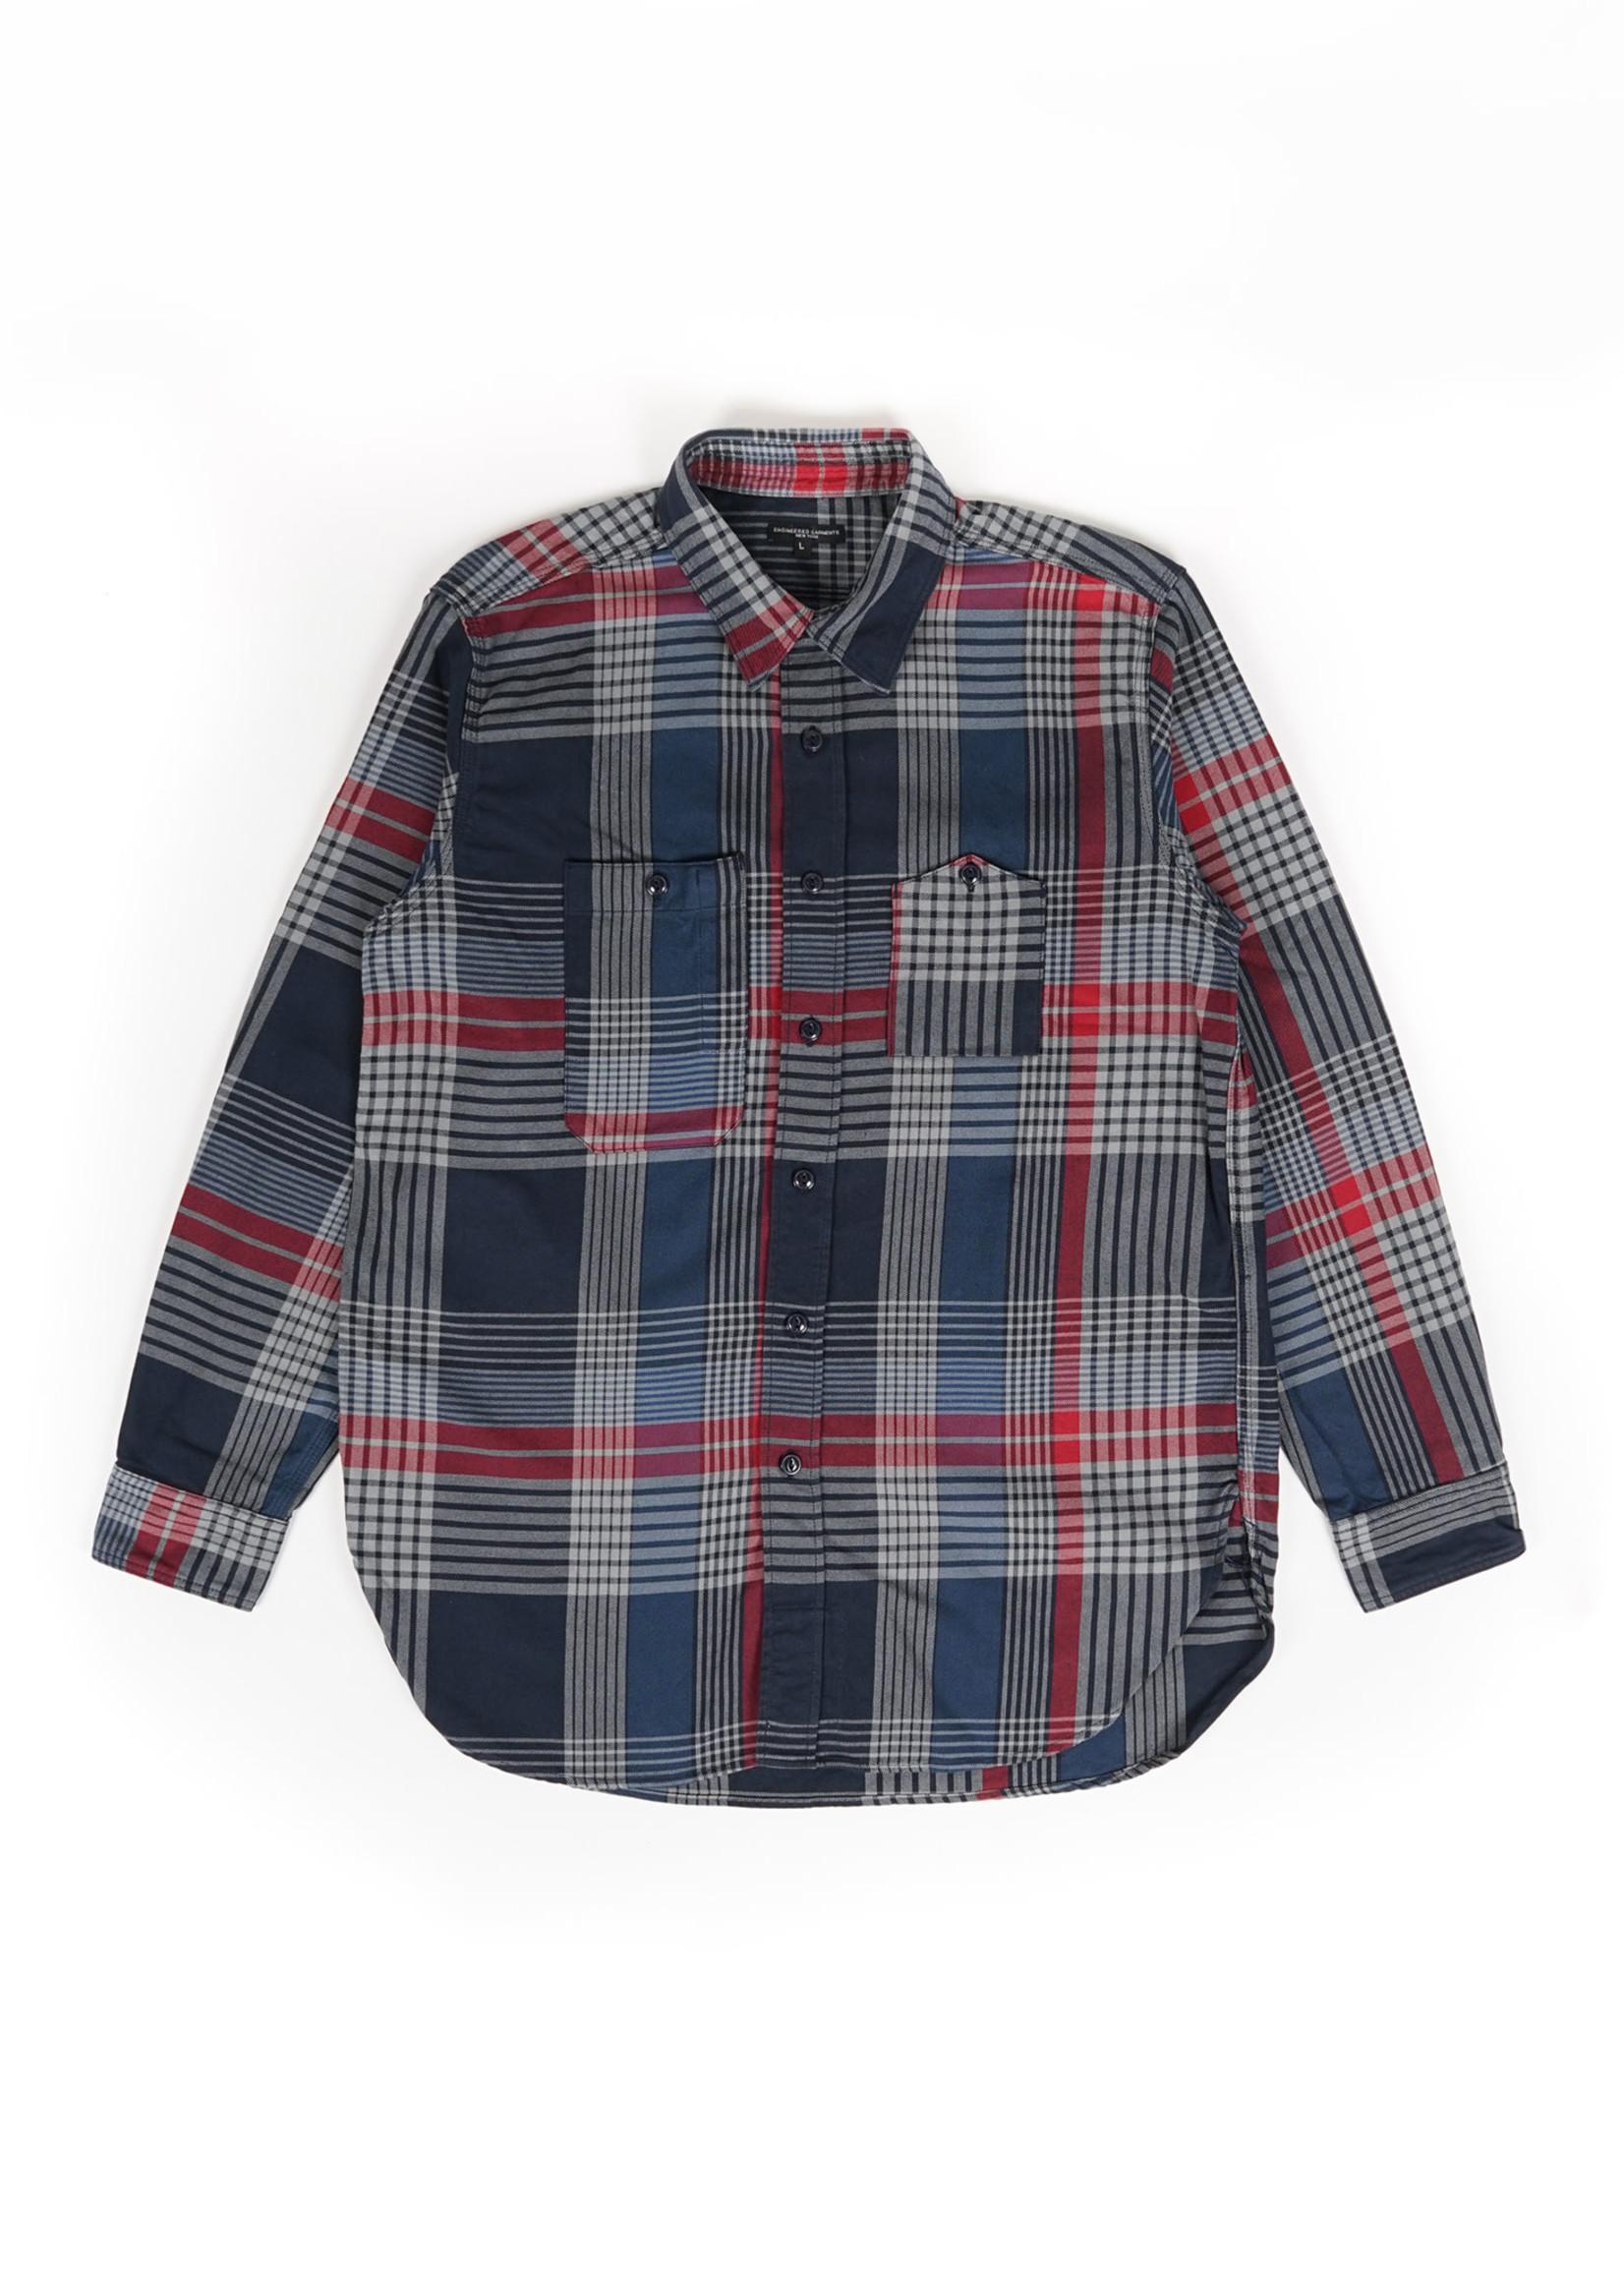 Engineered Garments Work Shirt Navy/Grey/Red Cotton Twill by Engineered Garments